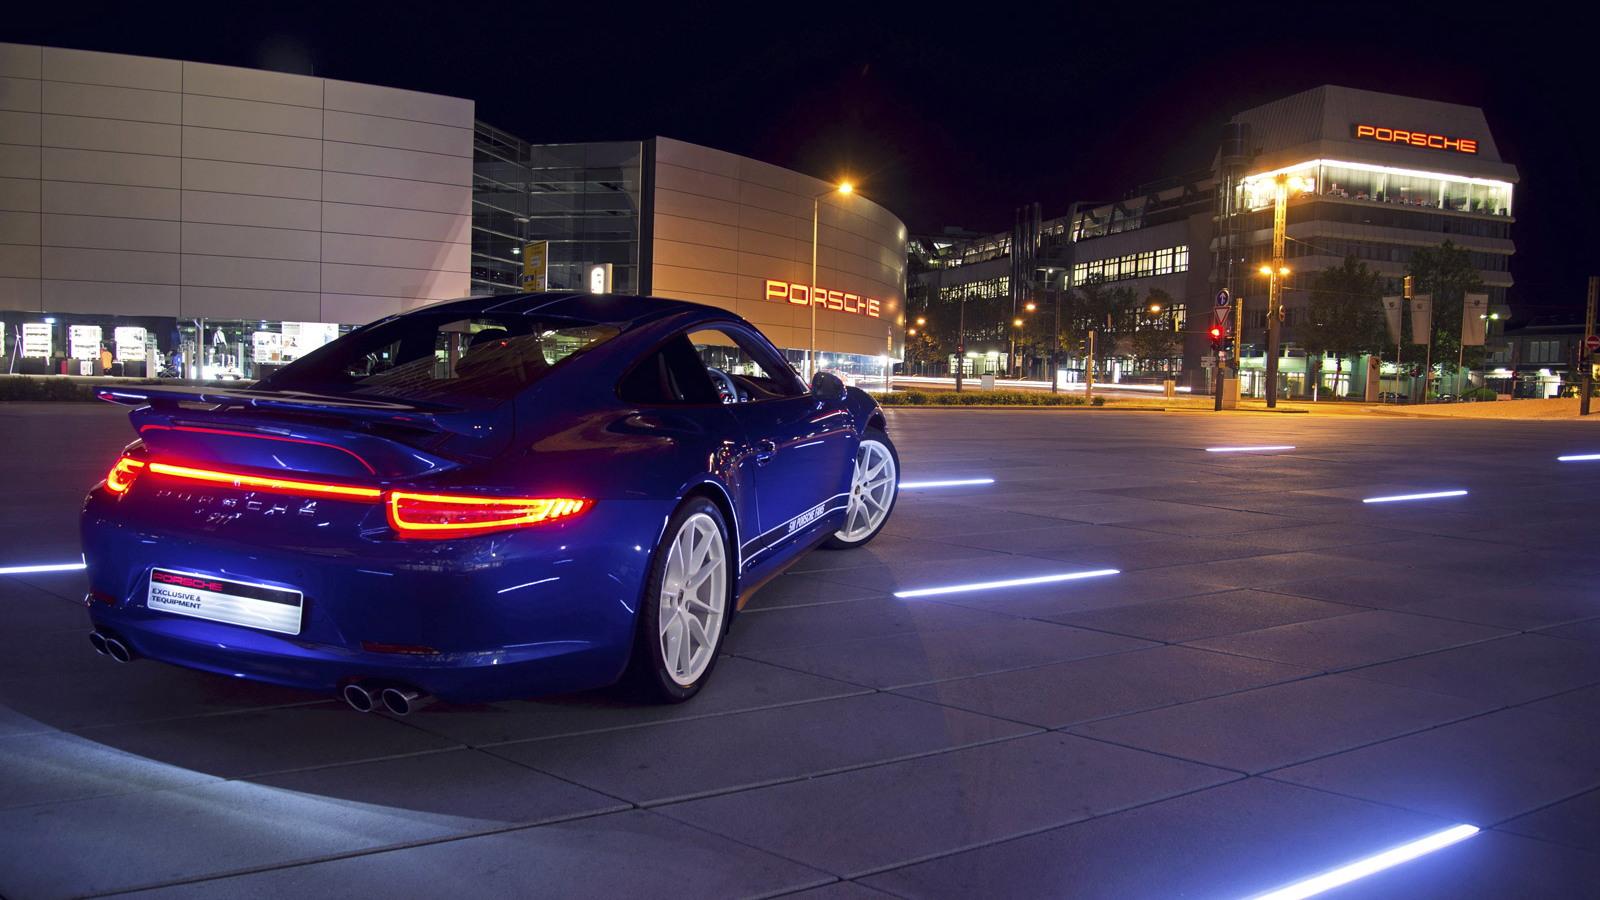 2013 Porsche 911 Carrera 4S 'built' by 5 million Facebook fans